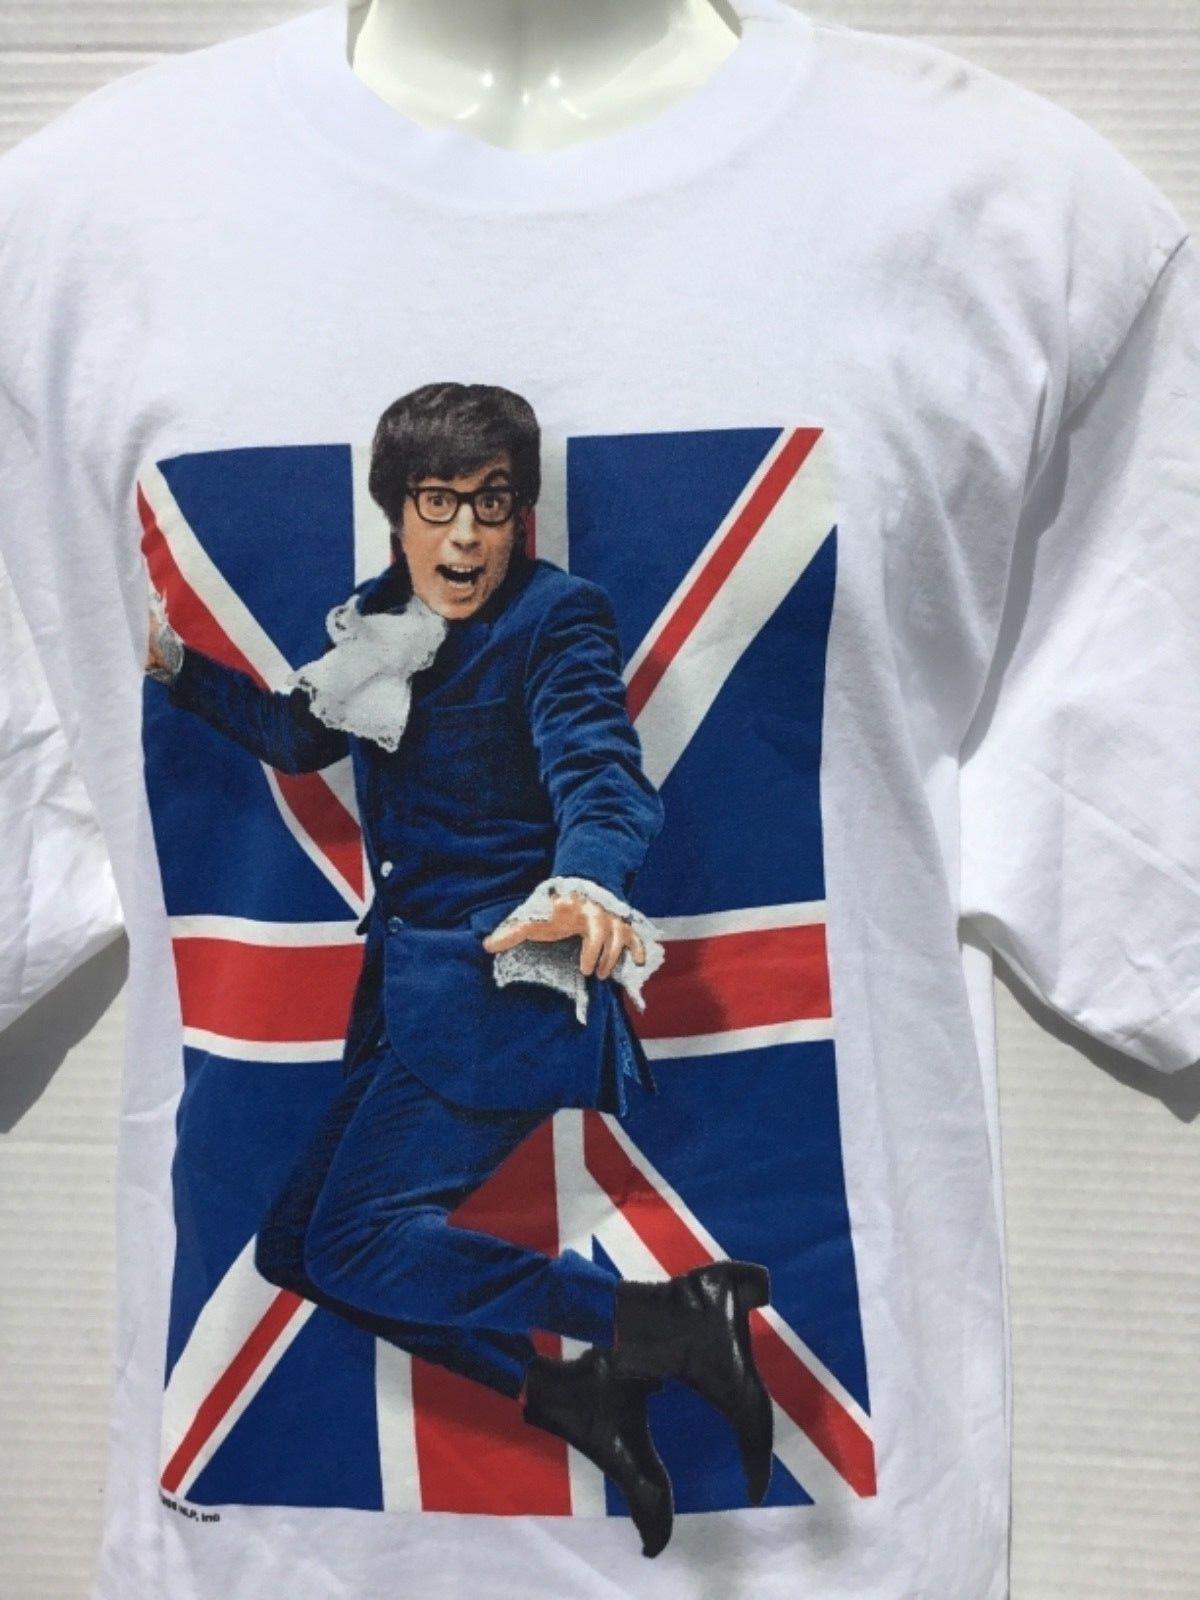 1998 Austin Powers camiseta blanca de 2 lados hecha en Estados Unidos MIKE MYERS raro NWOTCool Casual pride camiseta hombres Unisex camiseta de moda